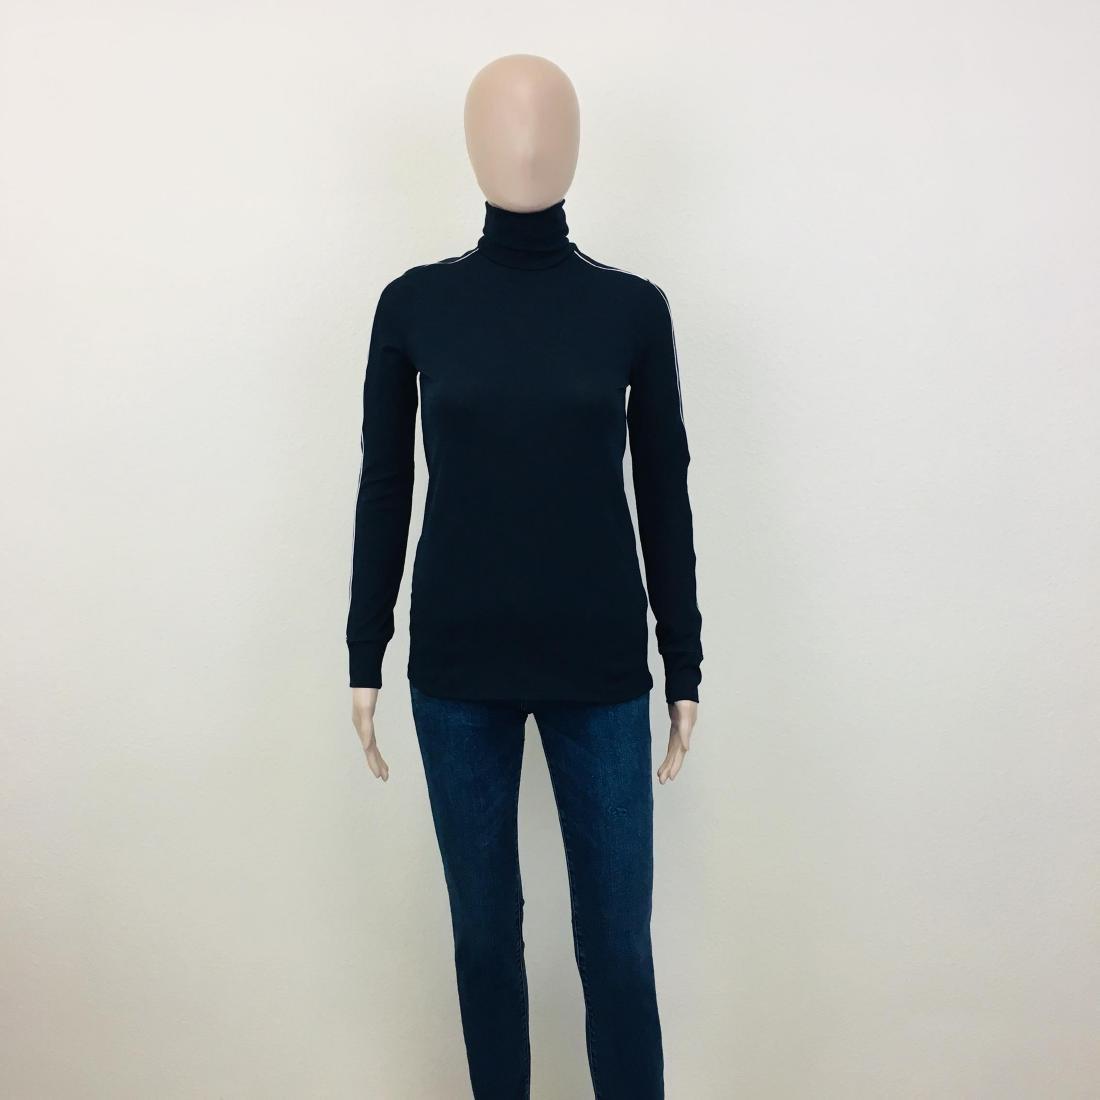 New Women's ZARA Turtleneck Sweater Size M - 2